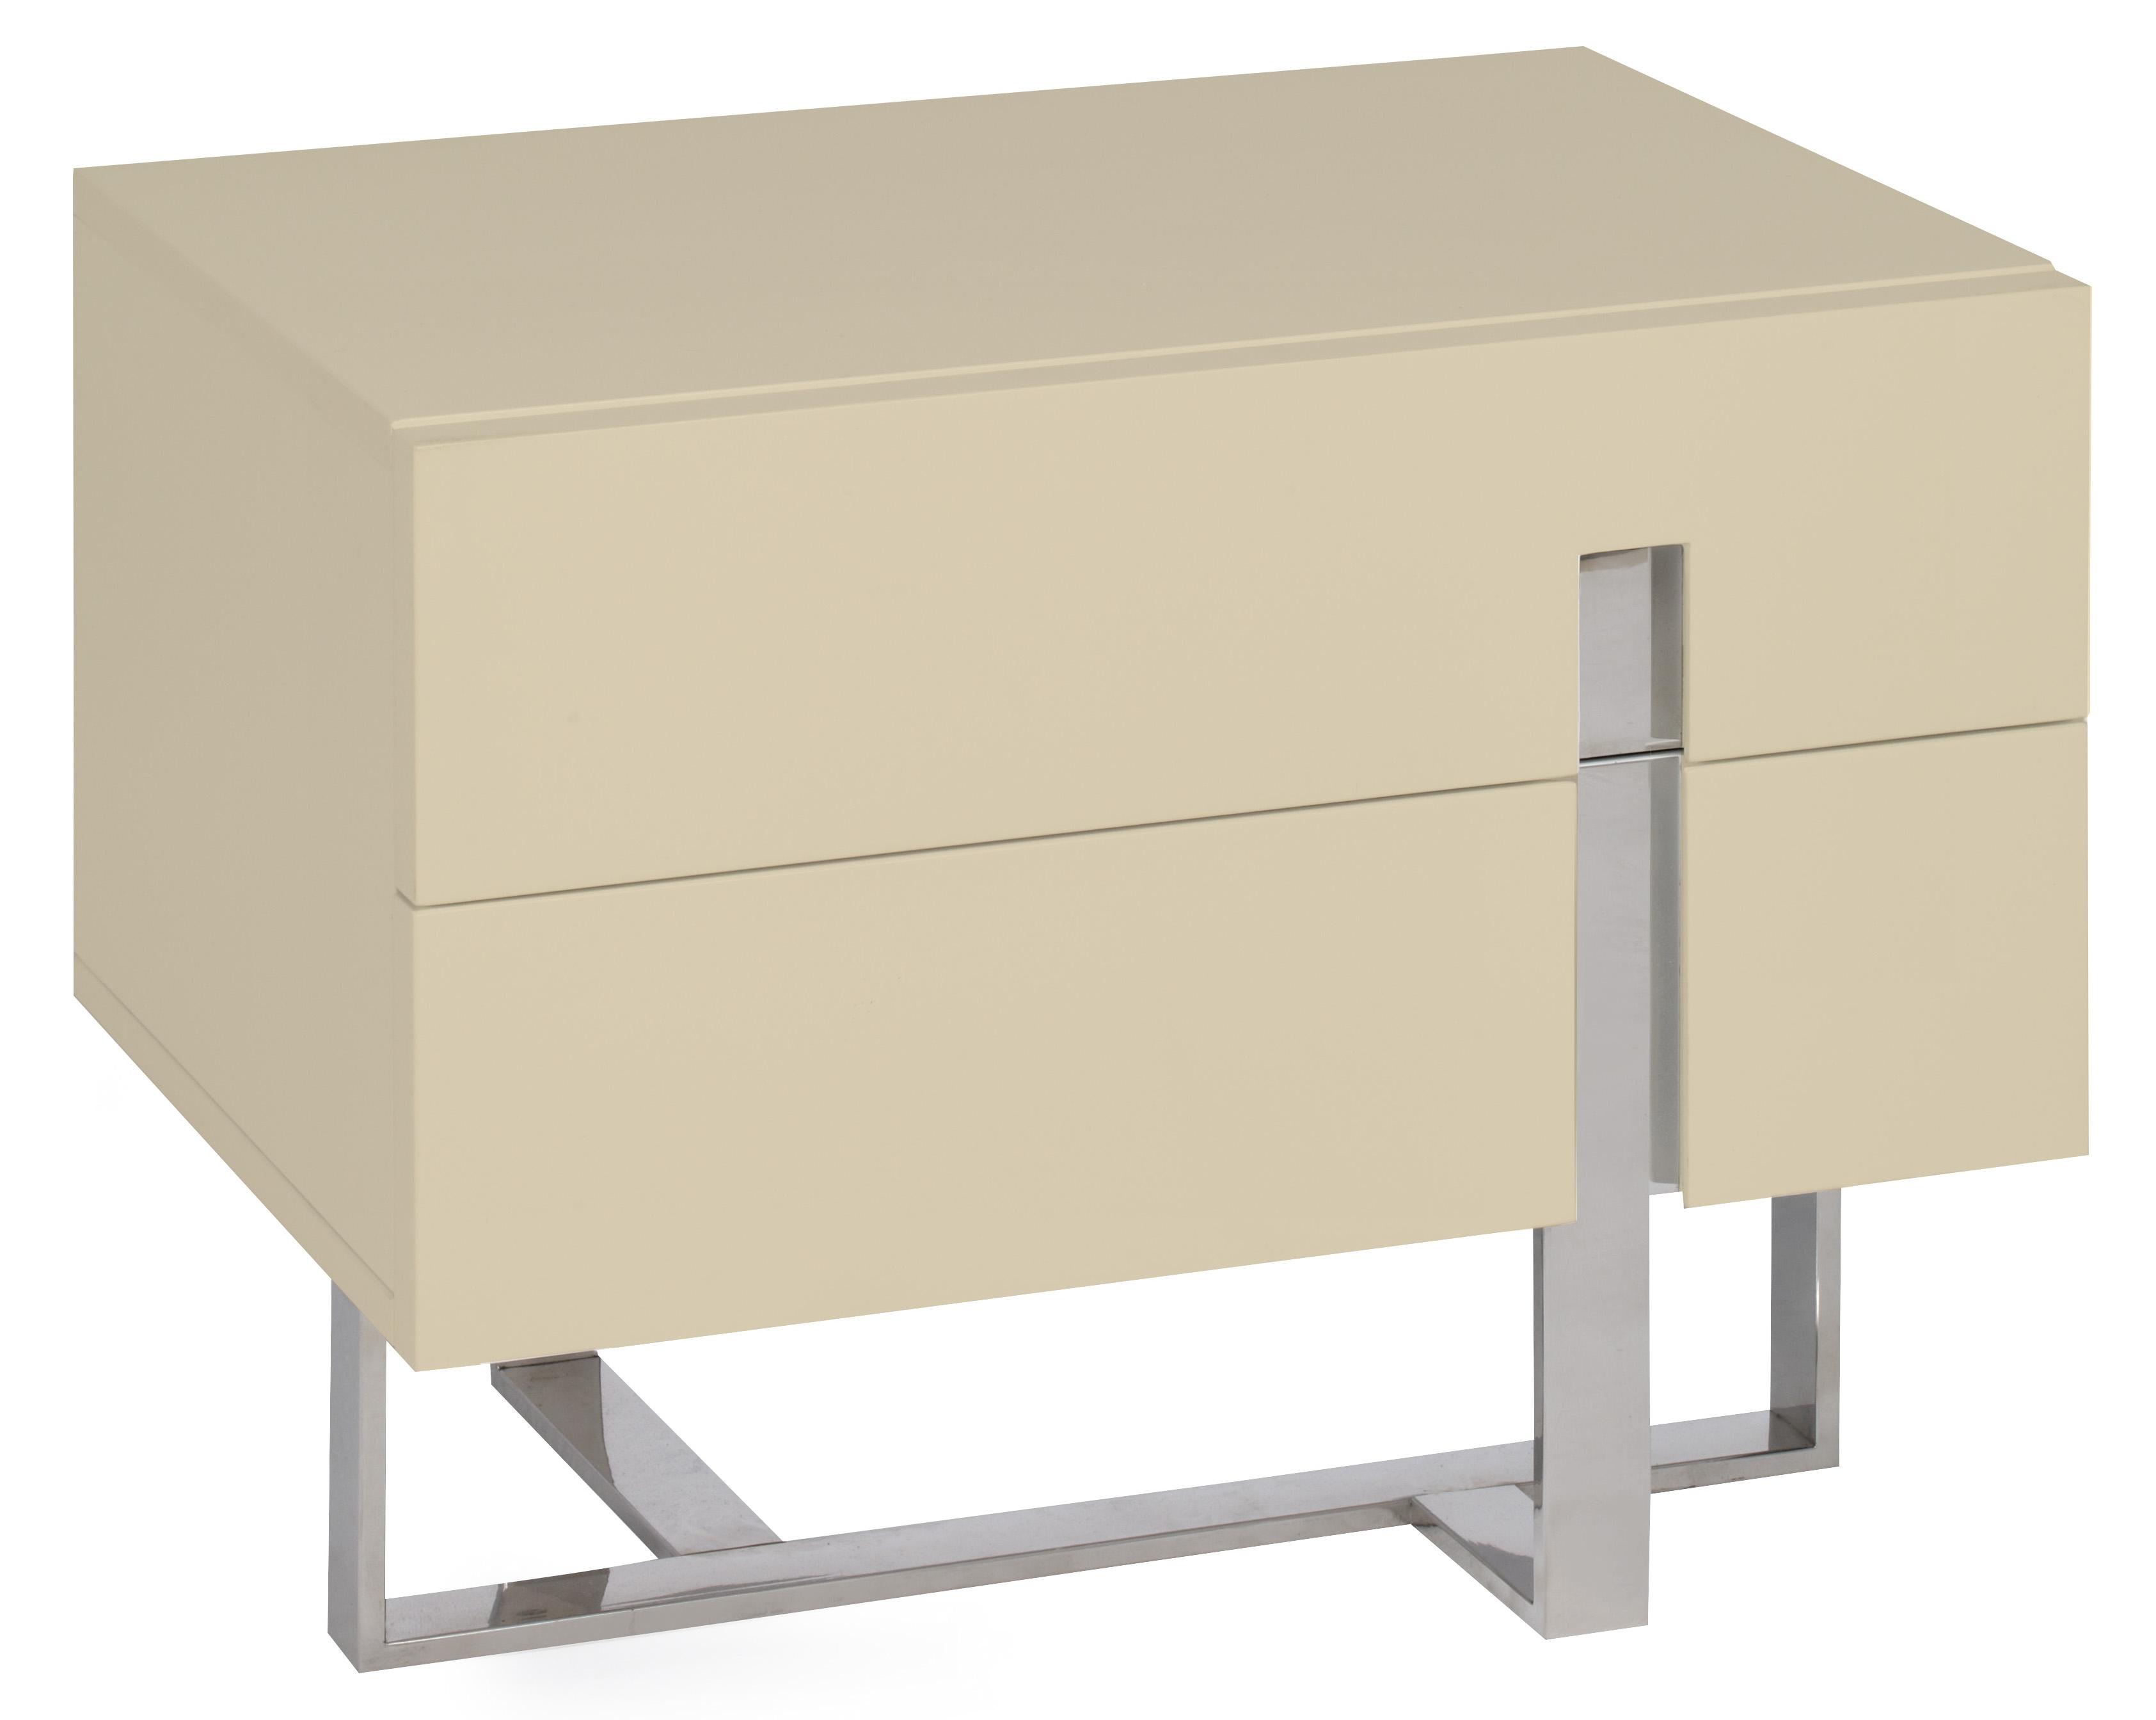 table de chevet moderne cr me laqu et acier dezina. Black Bedroom Furniture Sets. Home Design Ideas